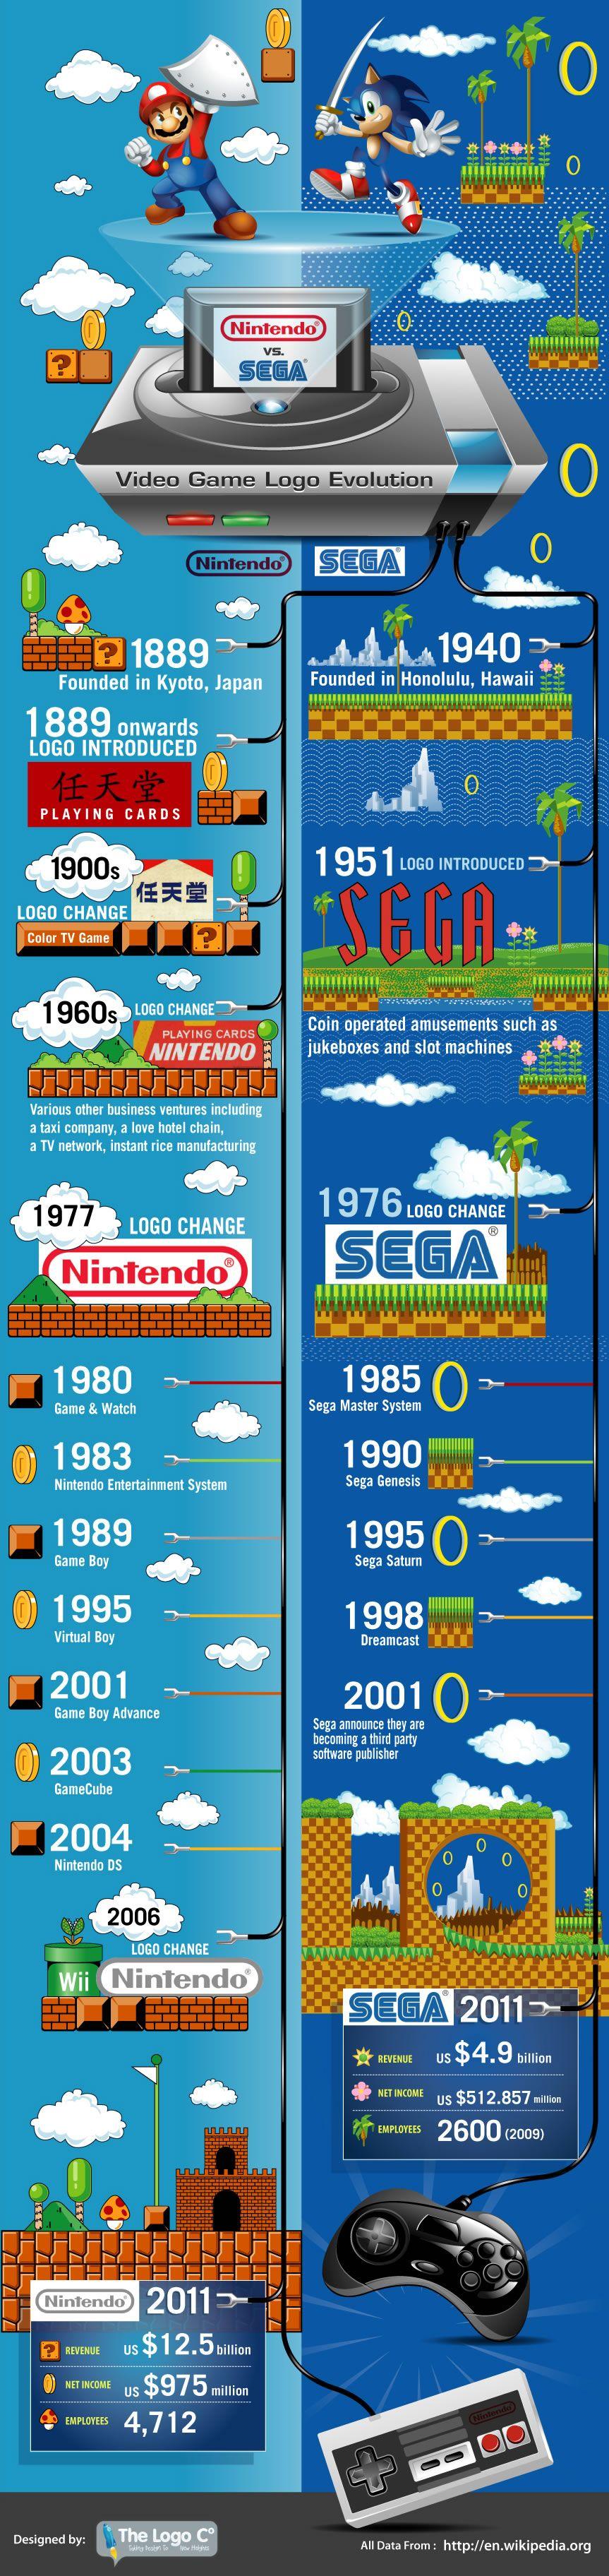 Infographic Nintendo vs Sega Video Game Logo Evolution